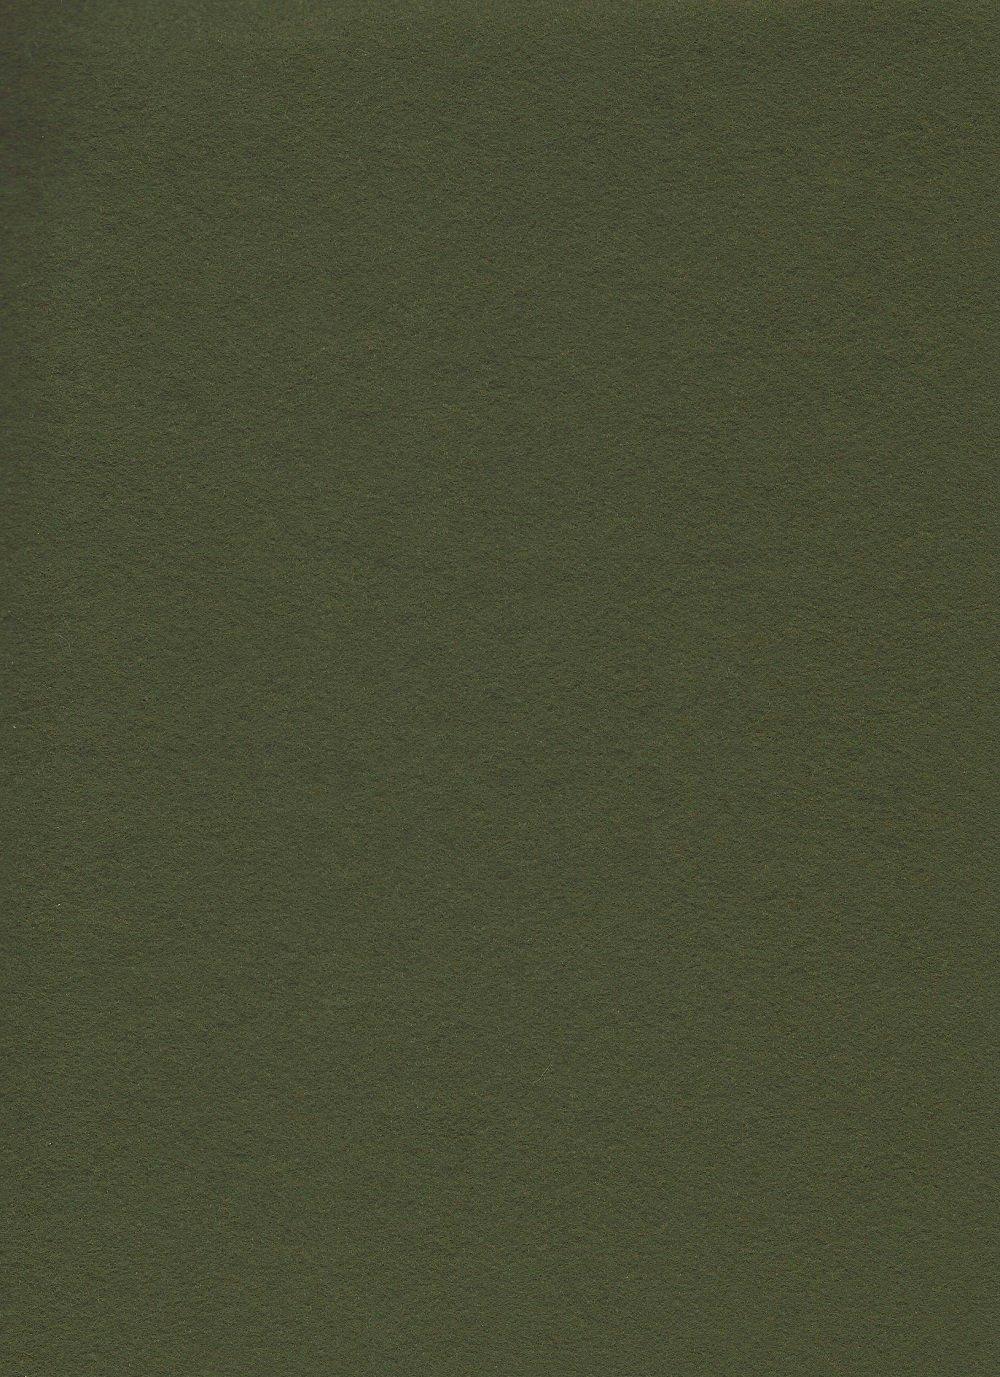 Cypress Garden - 12 x 18 Square